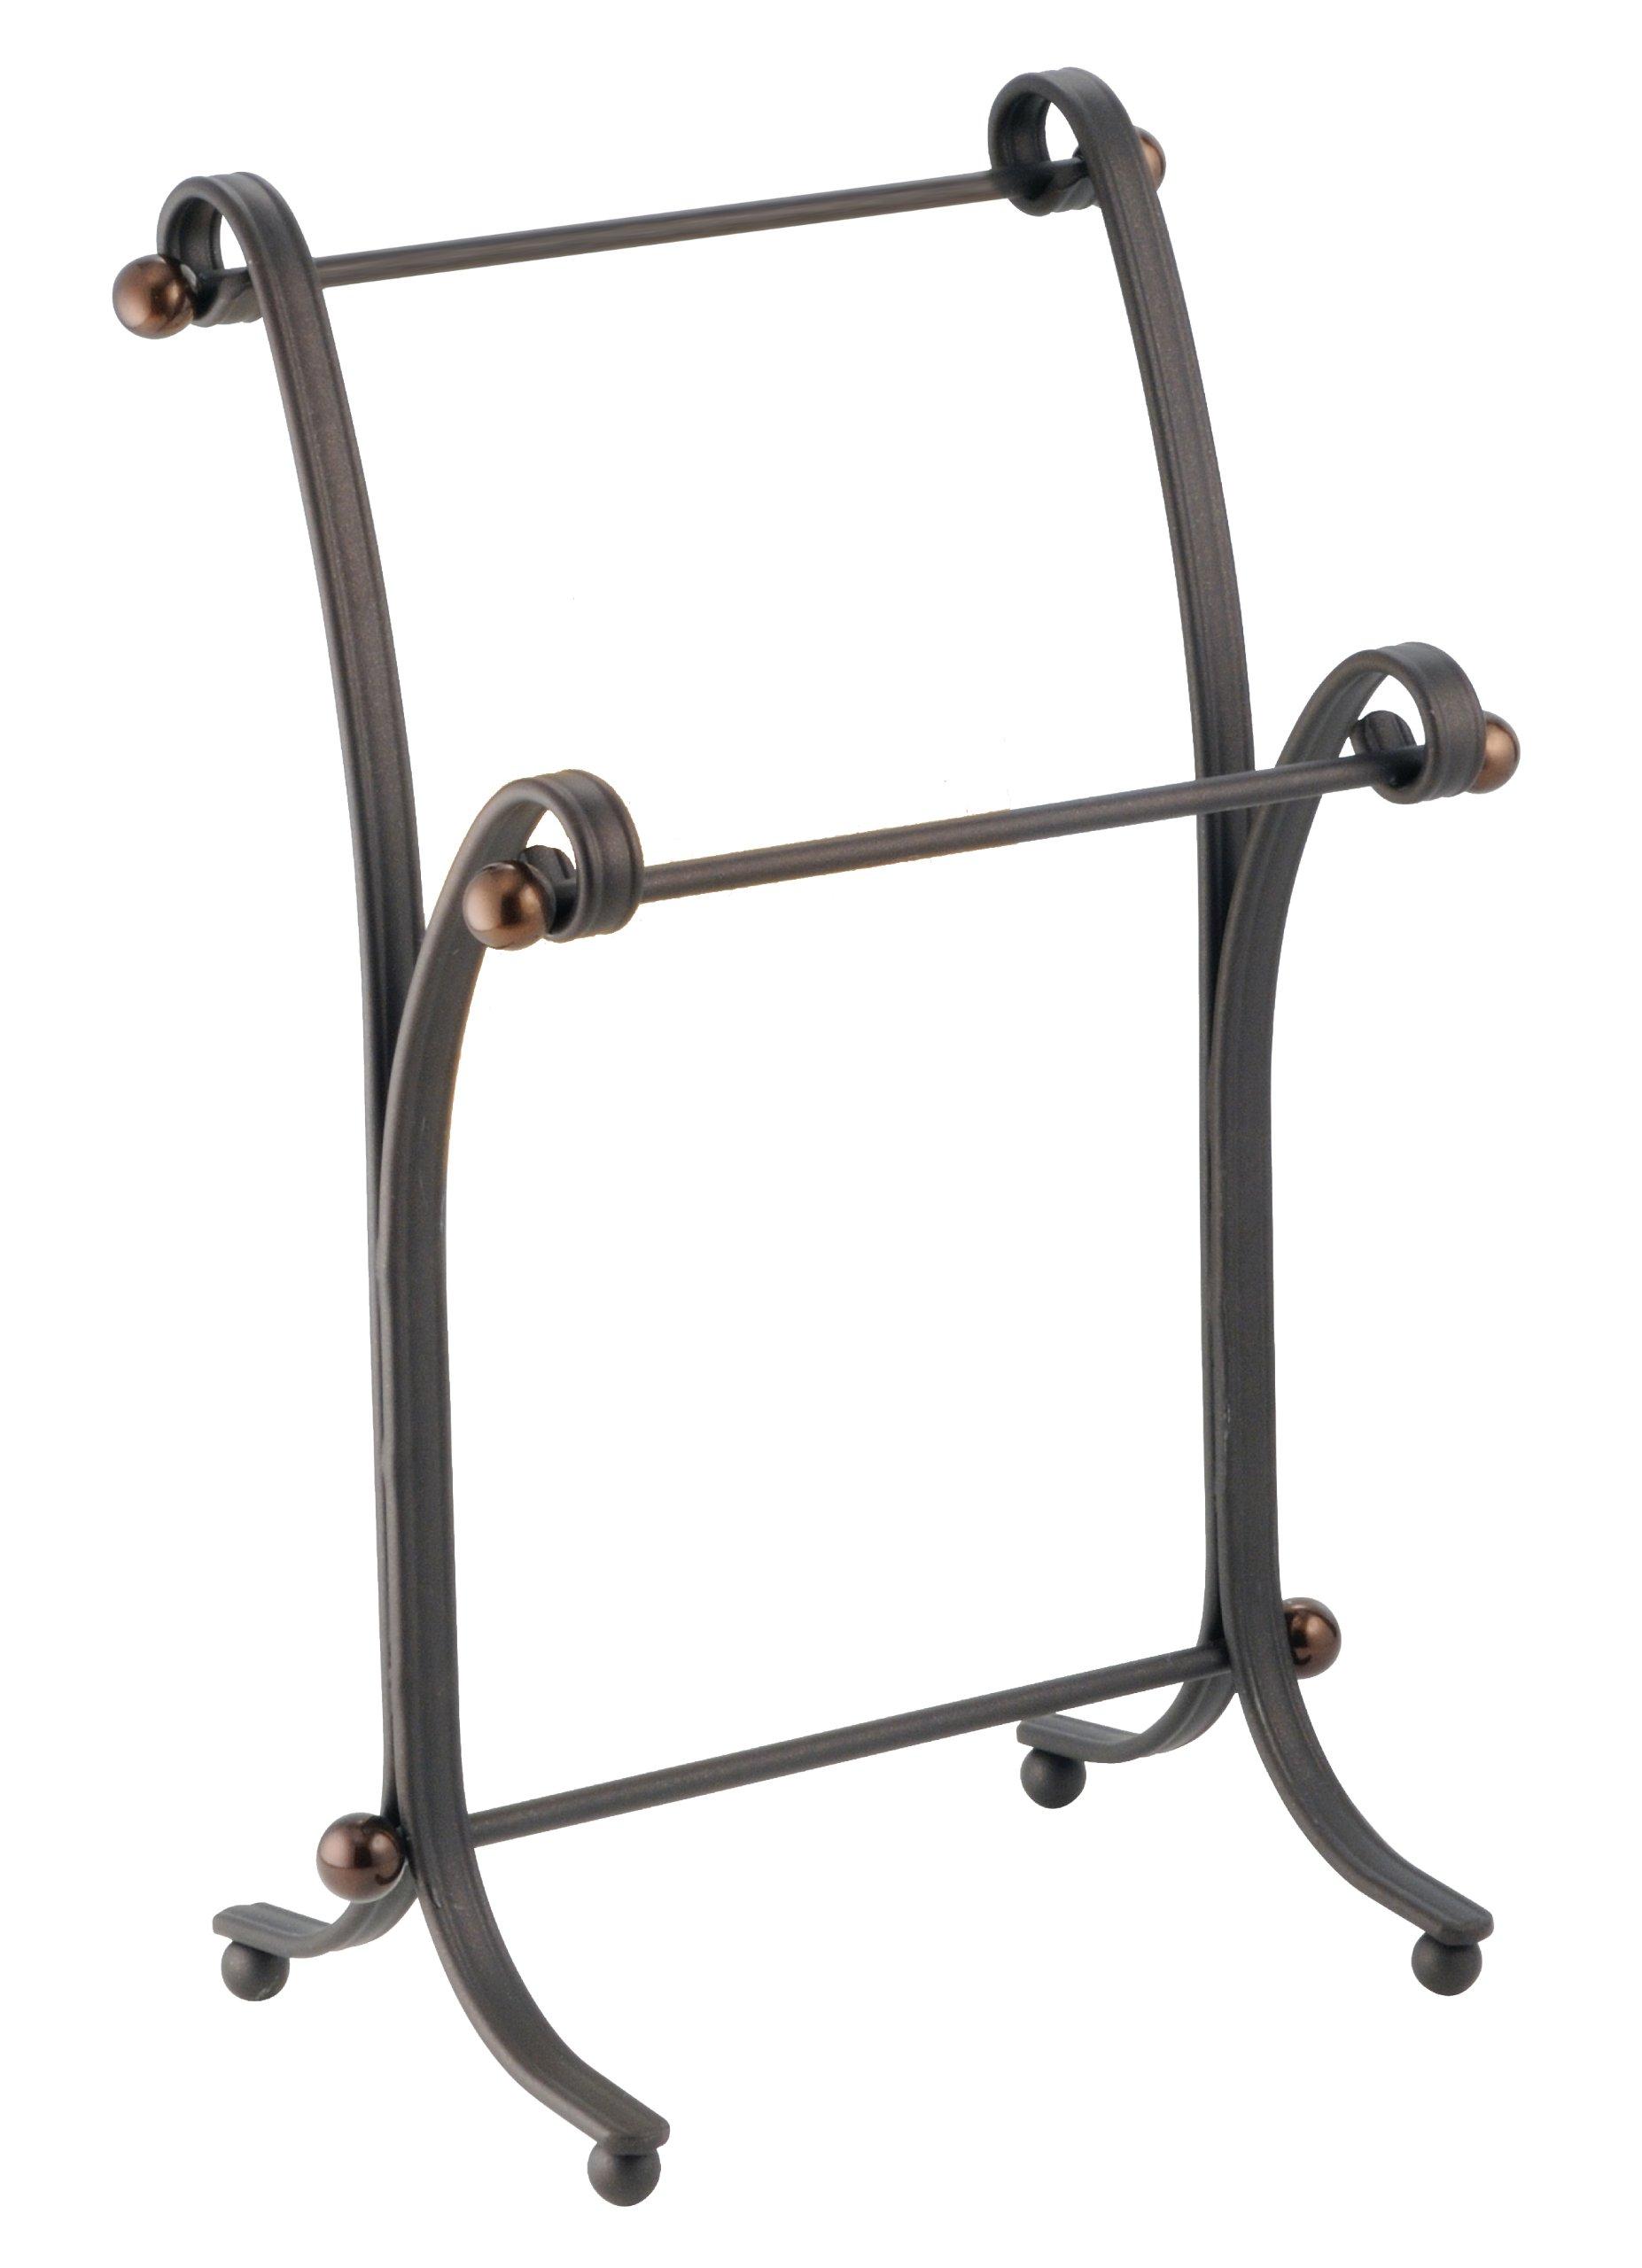 iDesign York Metal Bath Towel Holder Stand for Bathroom Vanities - Bronze by iDesign